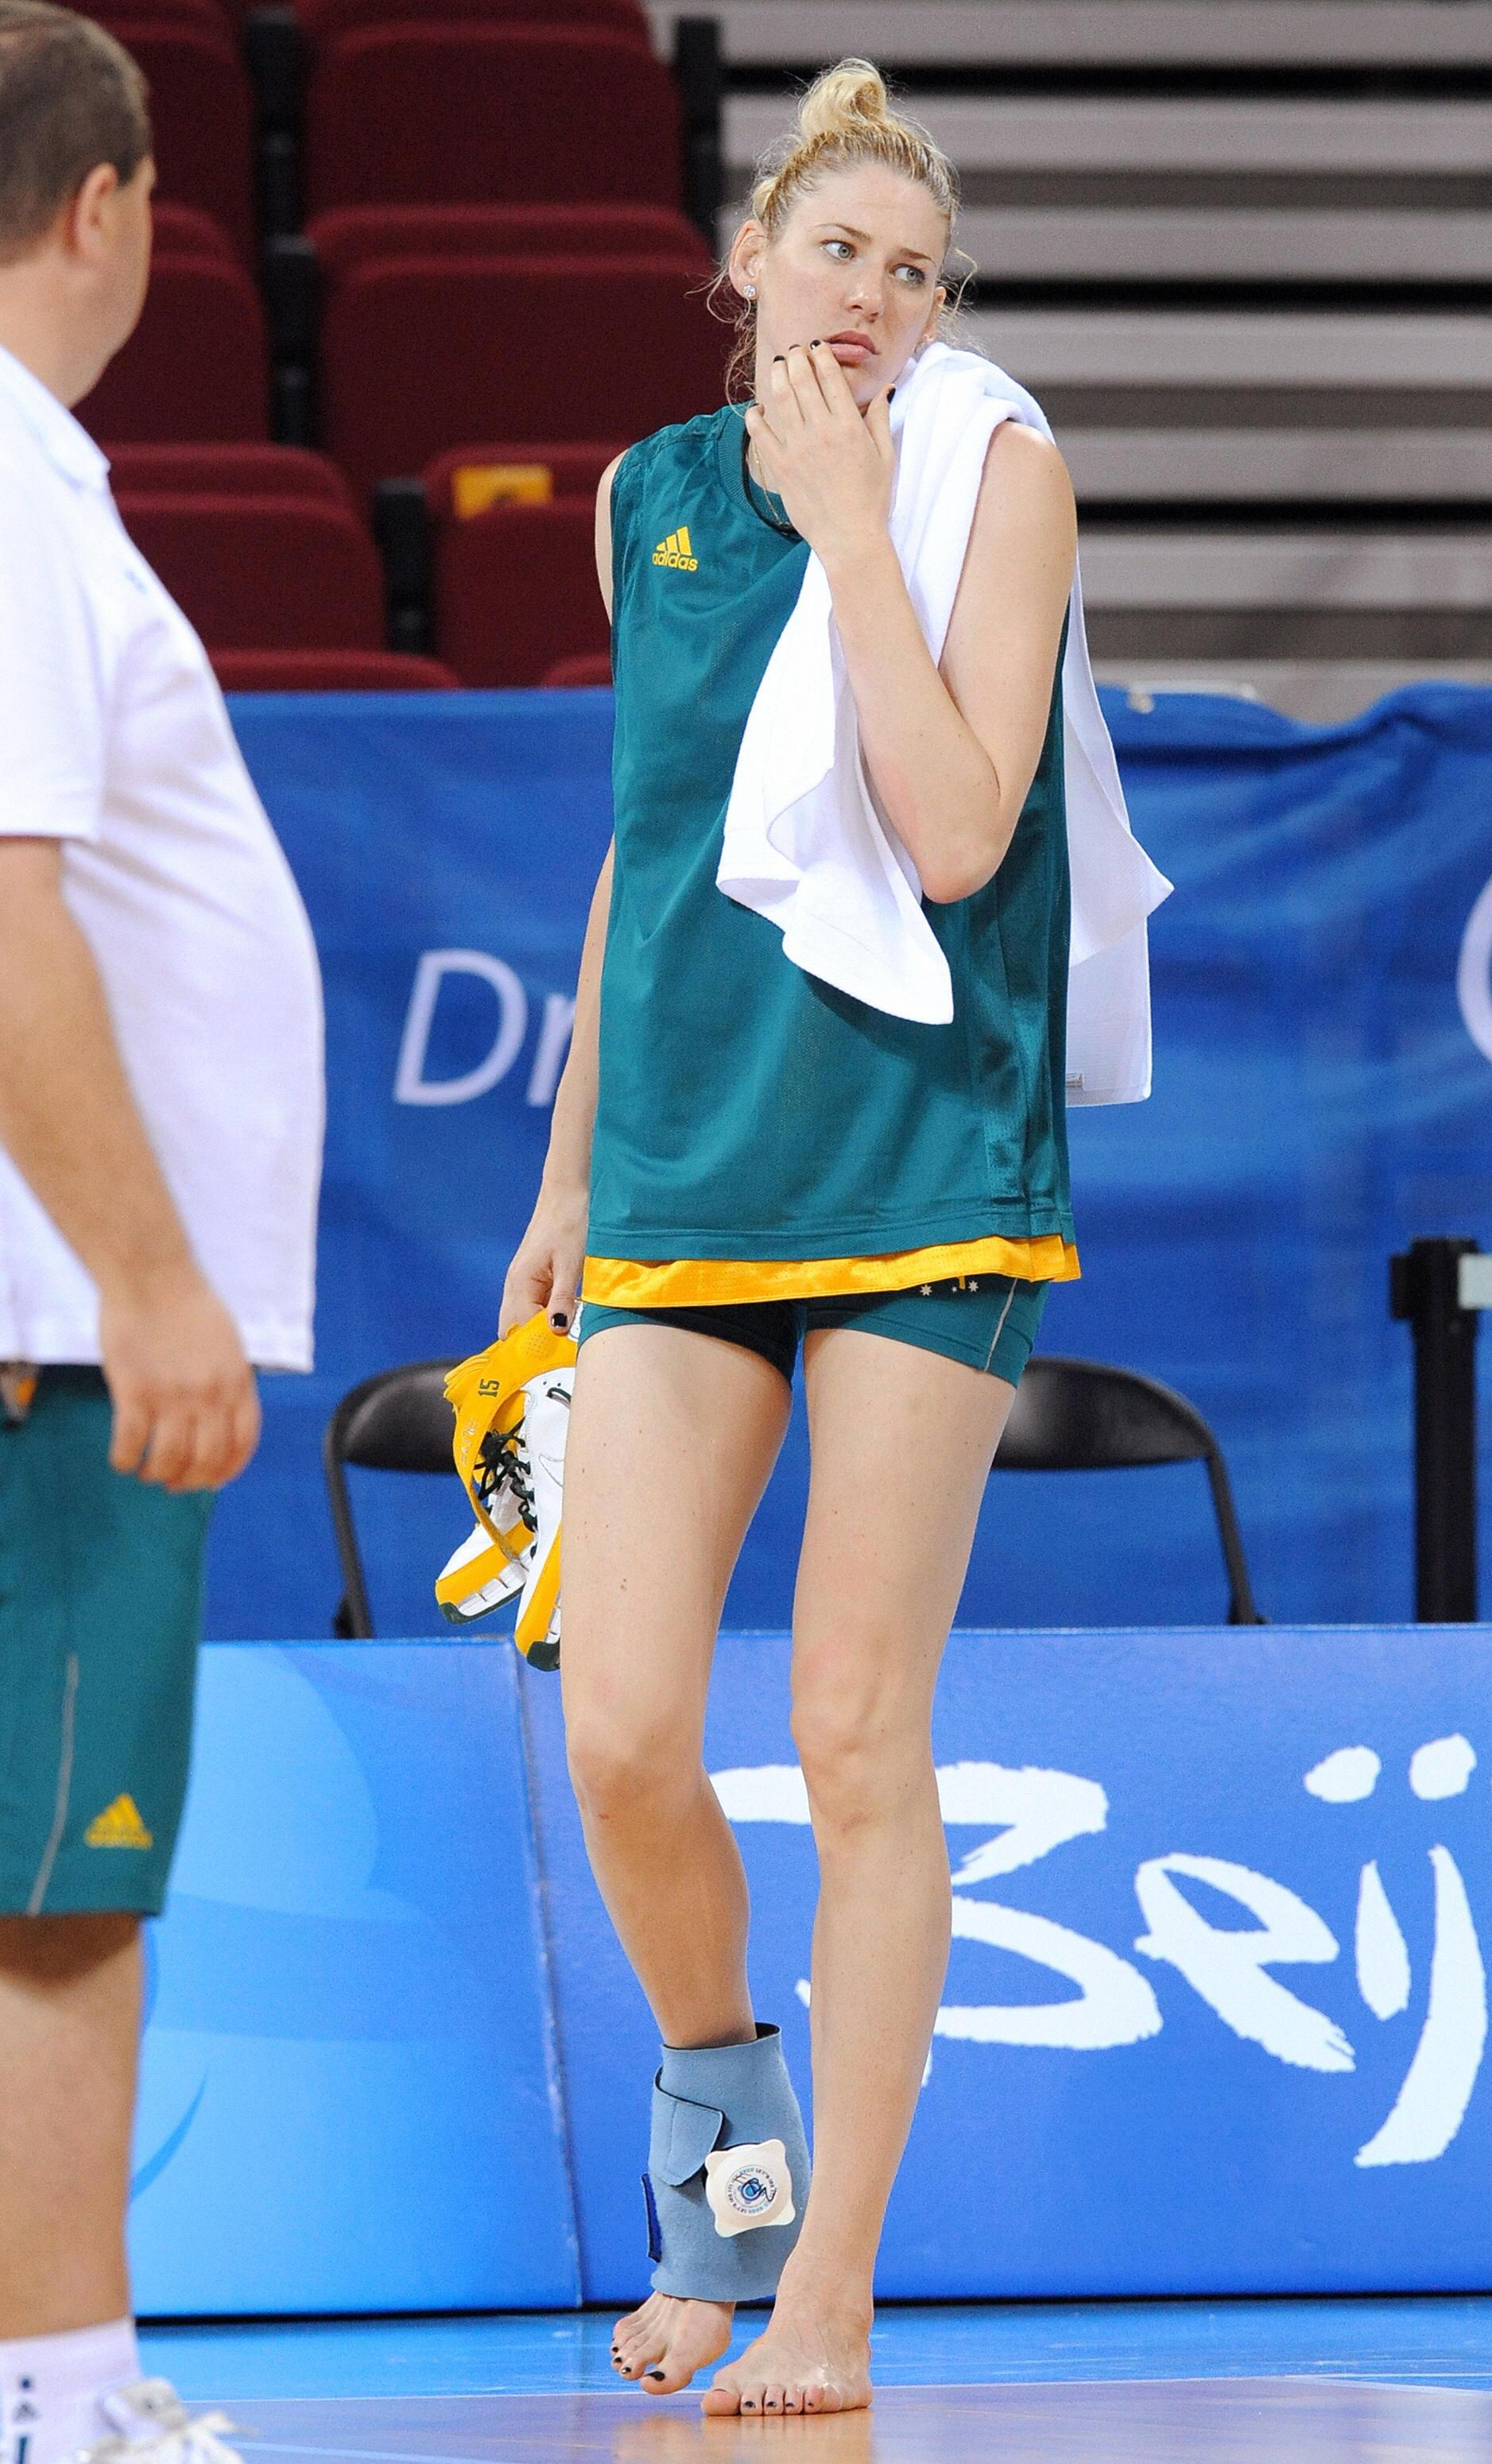 Pretty Girl S Basketball Uniforms